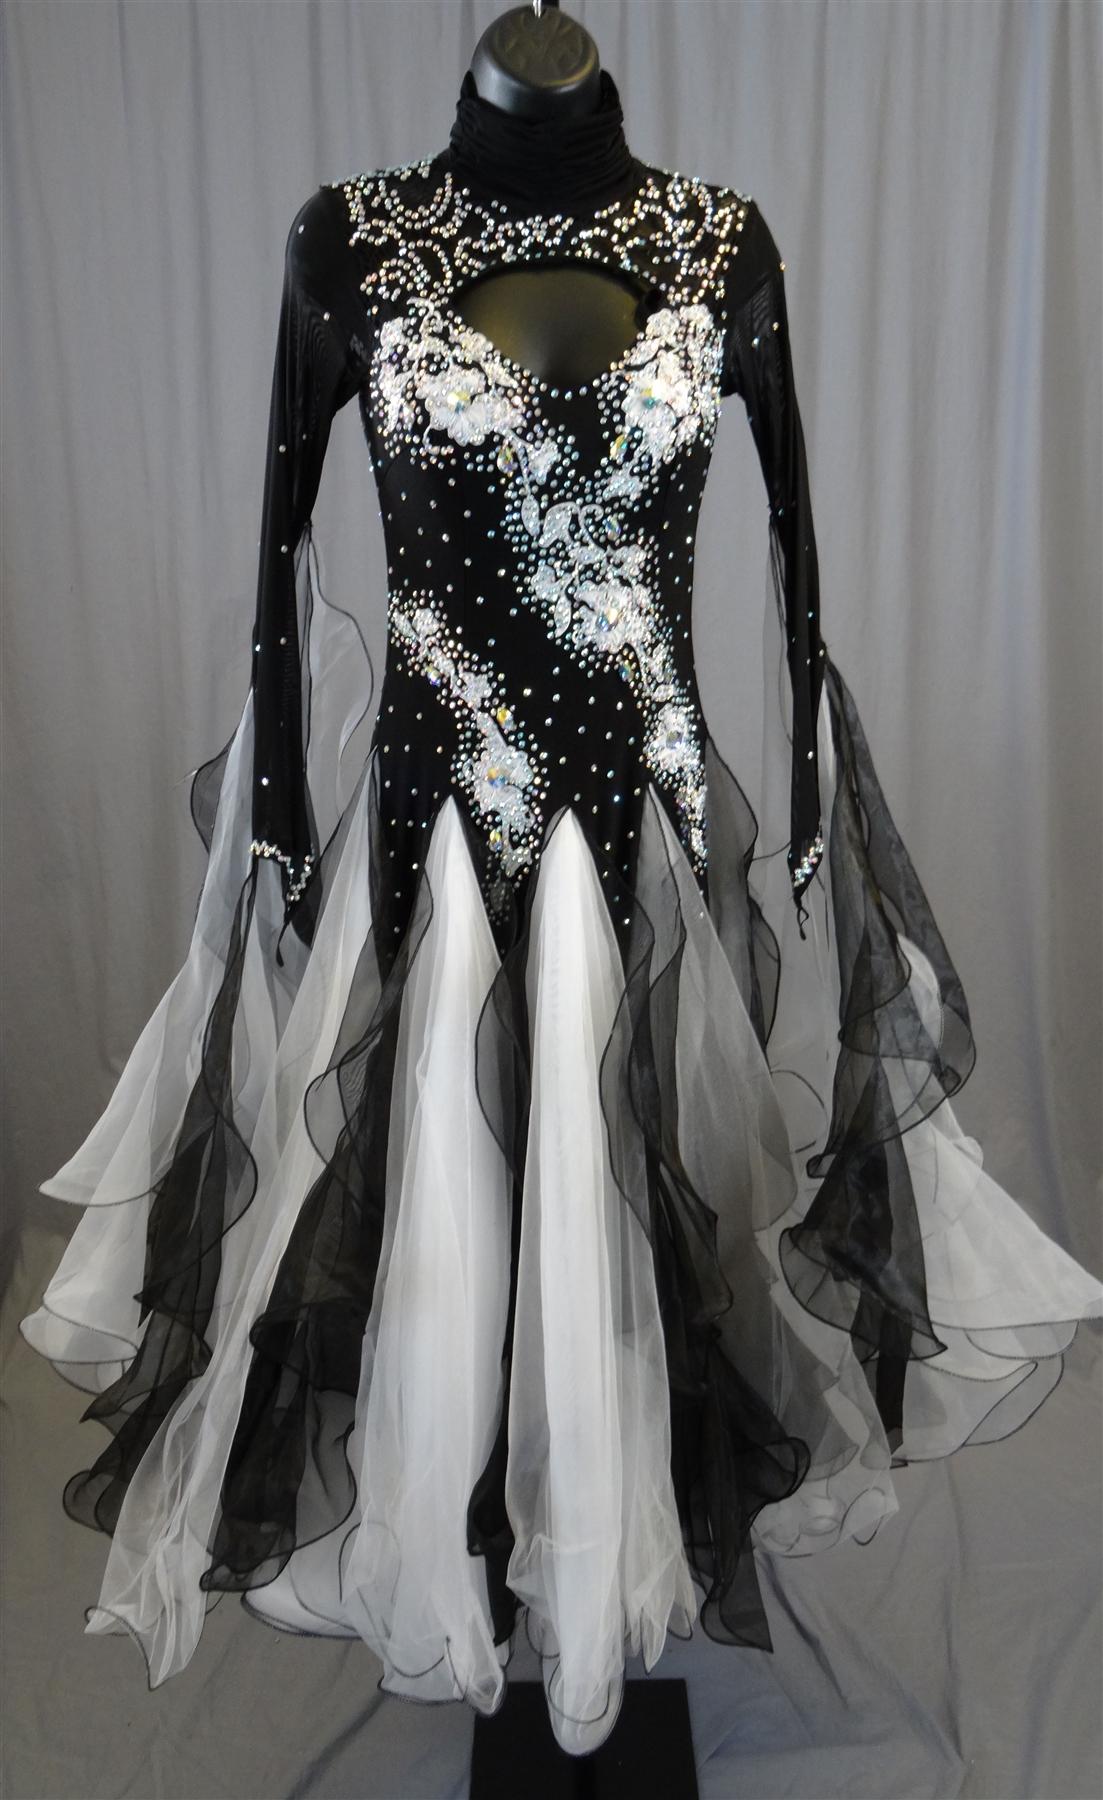 9998d21b9568f Elegant Black & White Ballroom Dress